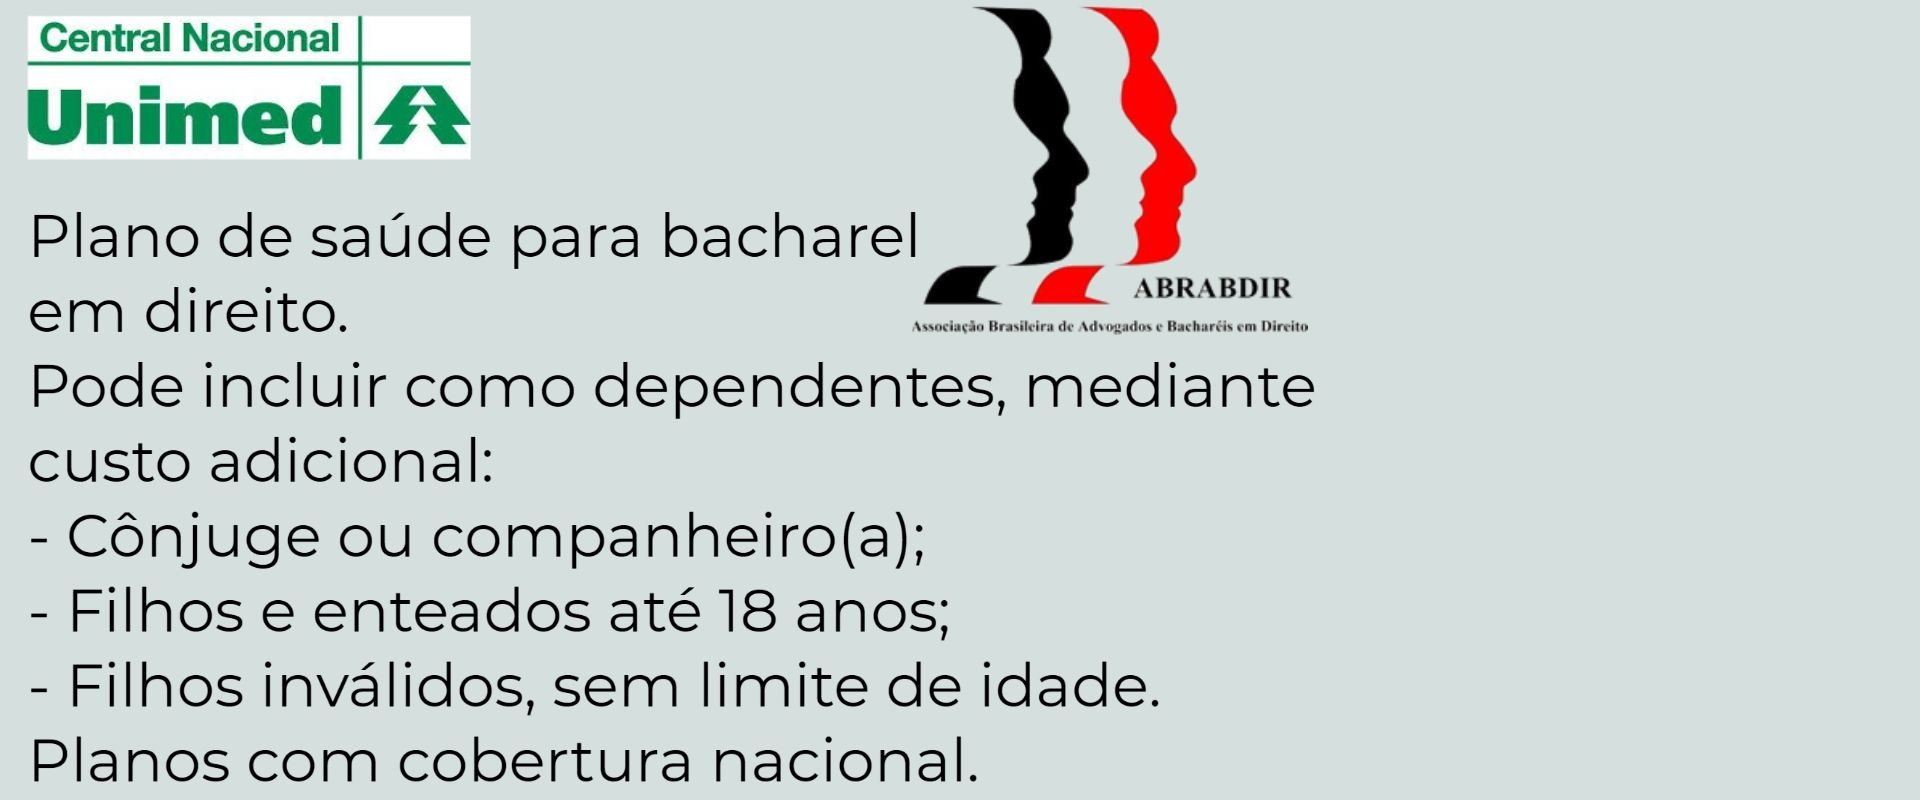 Unimed ABRABDIR Limeira